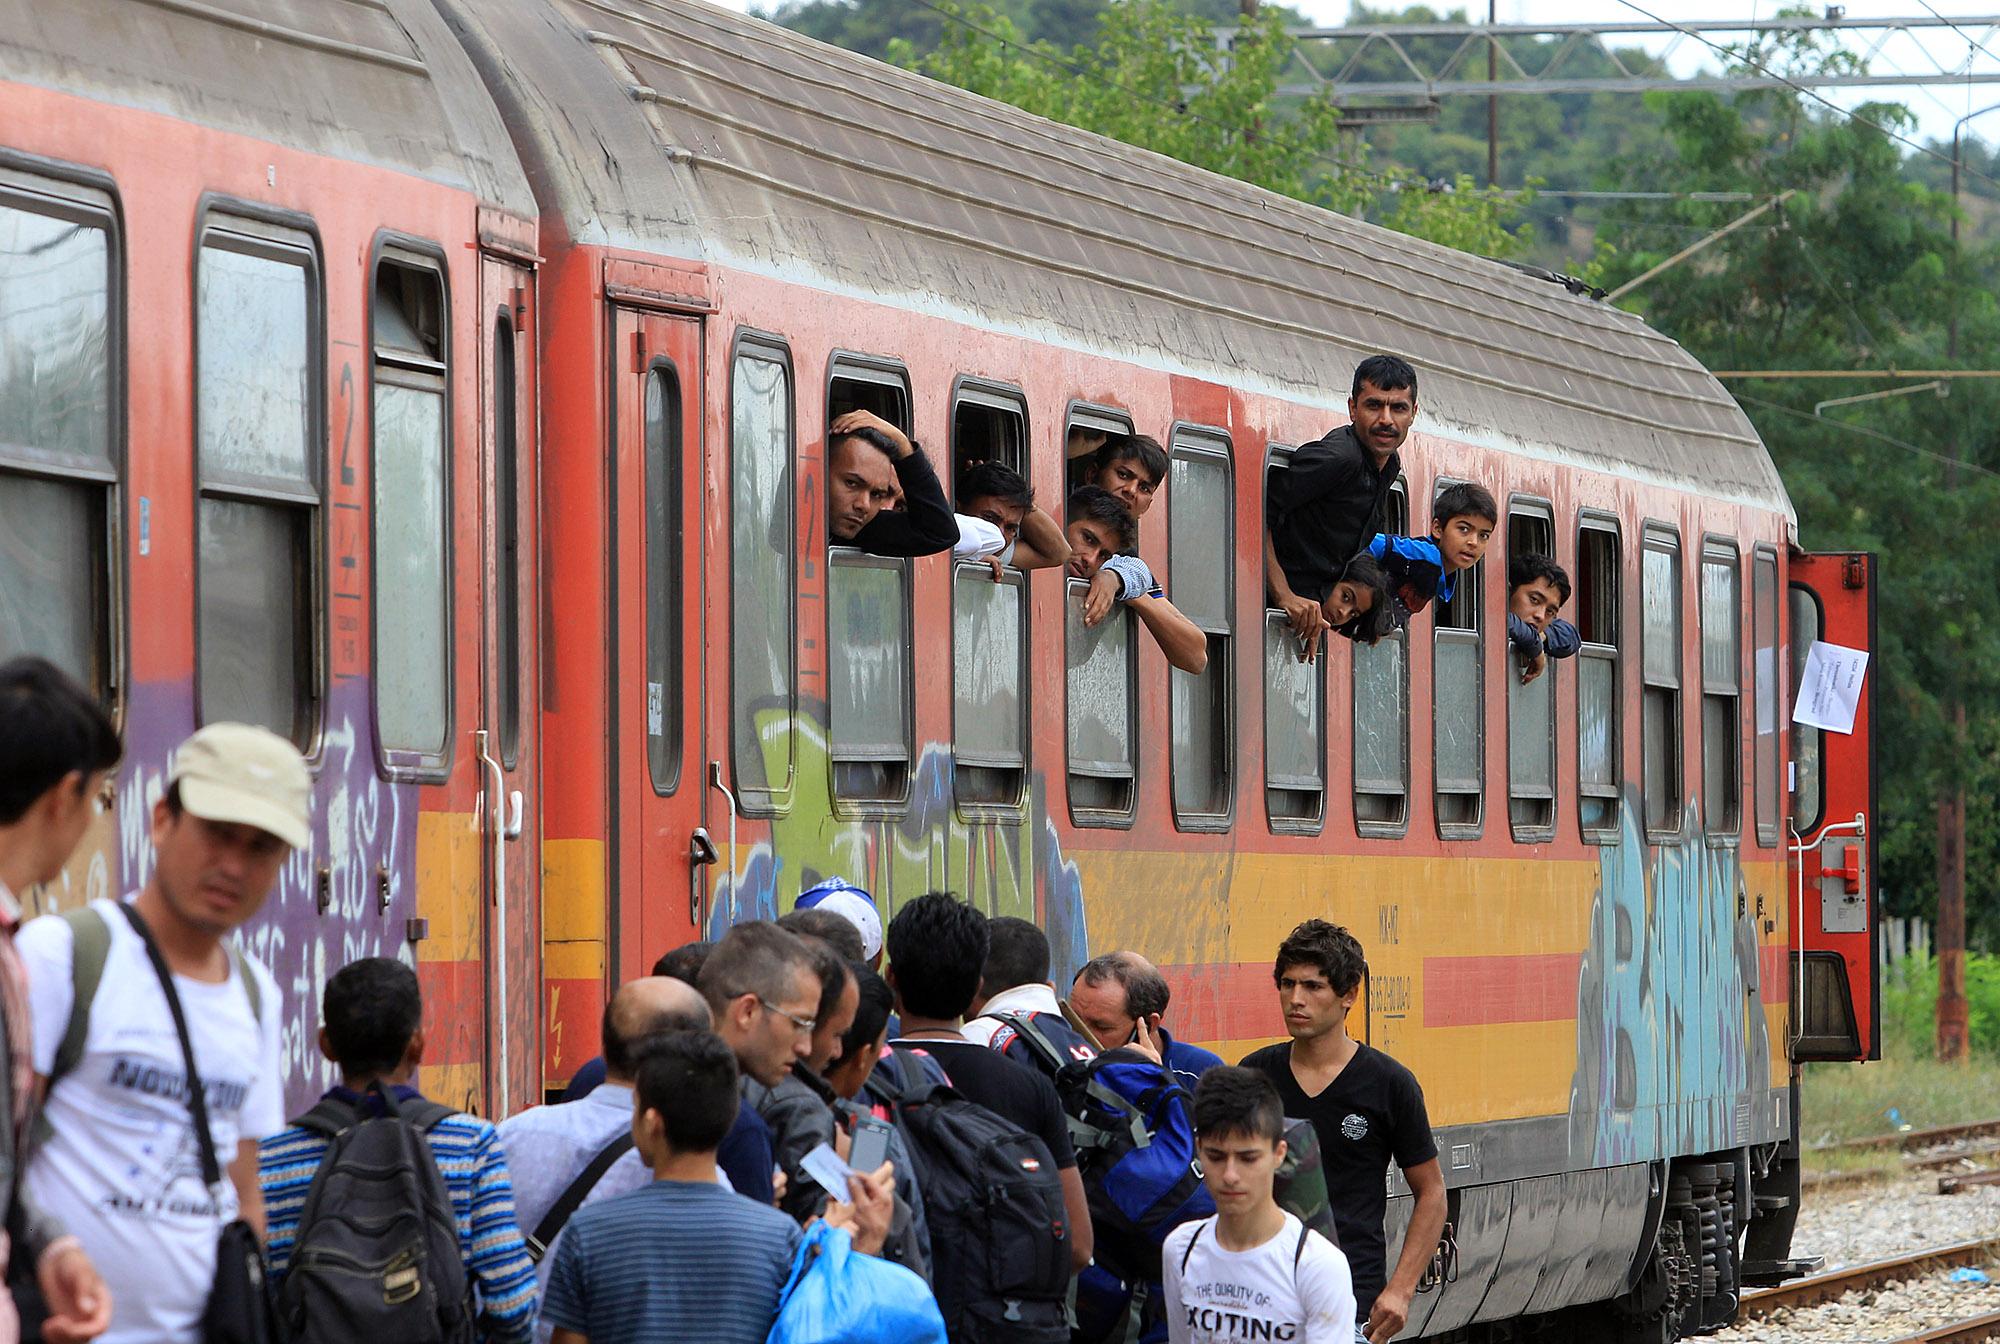 VMRO-DPMNE insists on a referendum against refugees